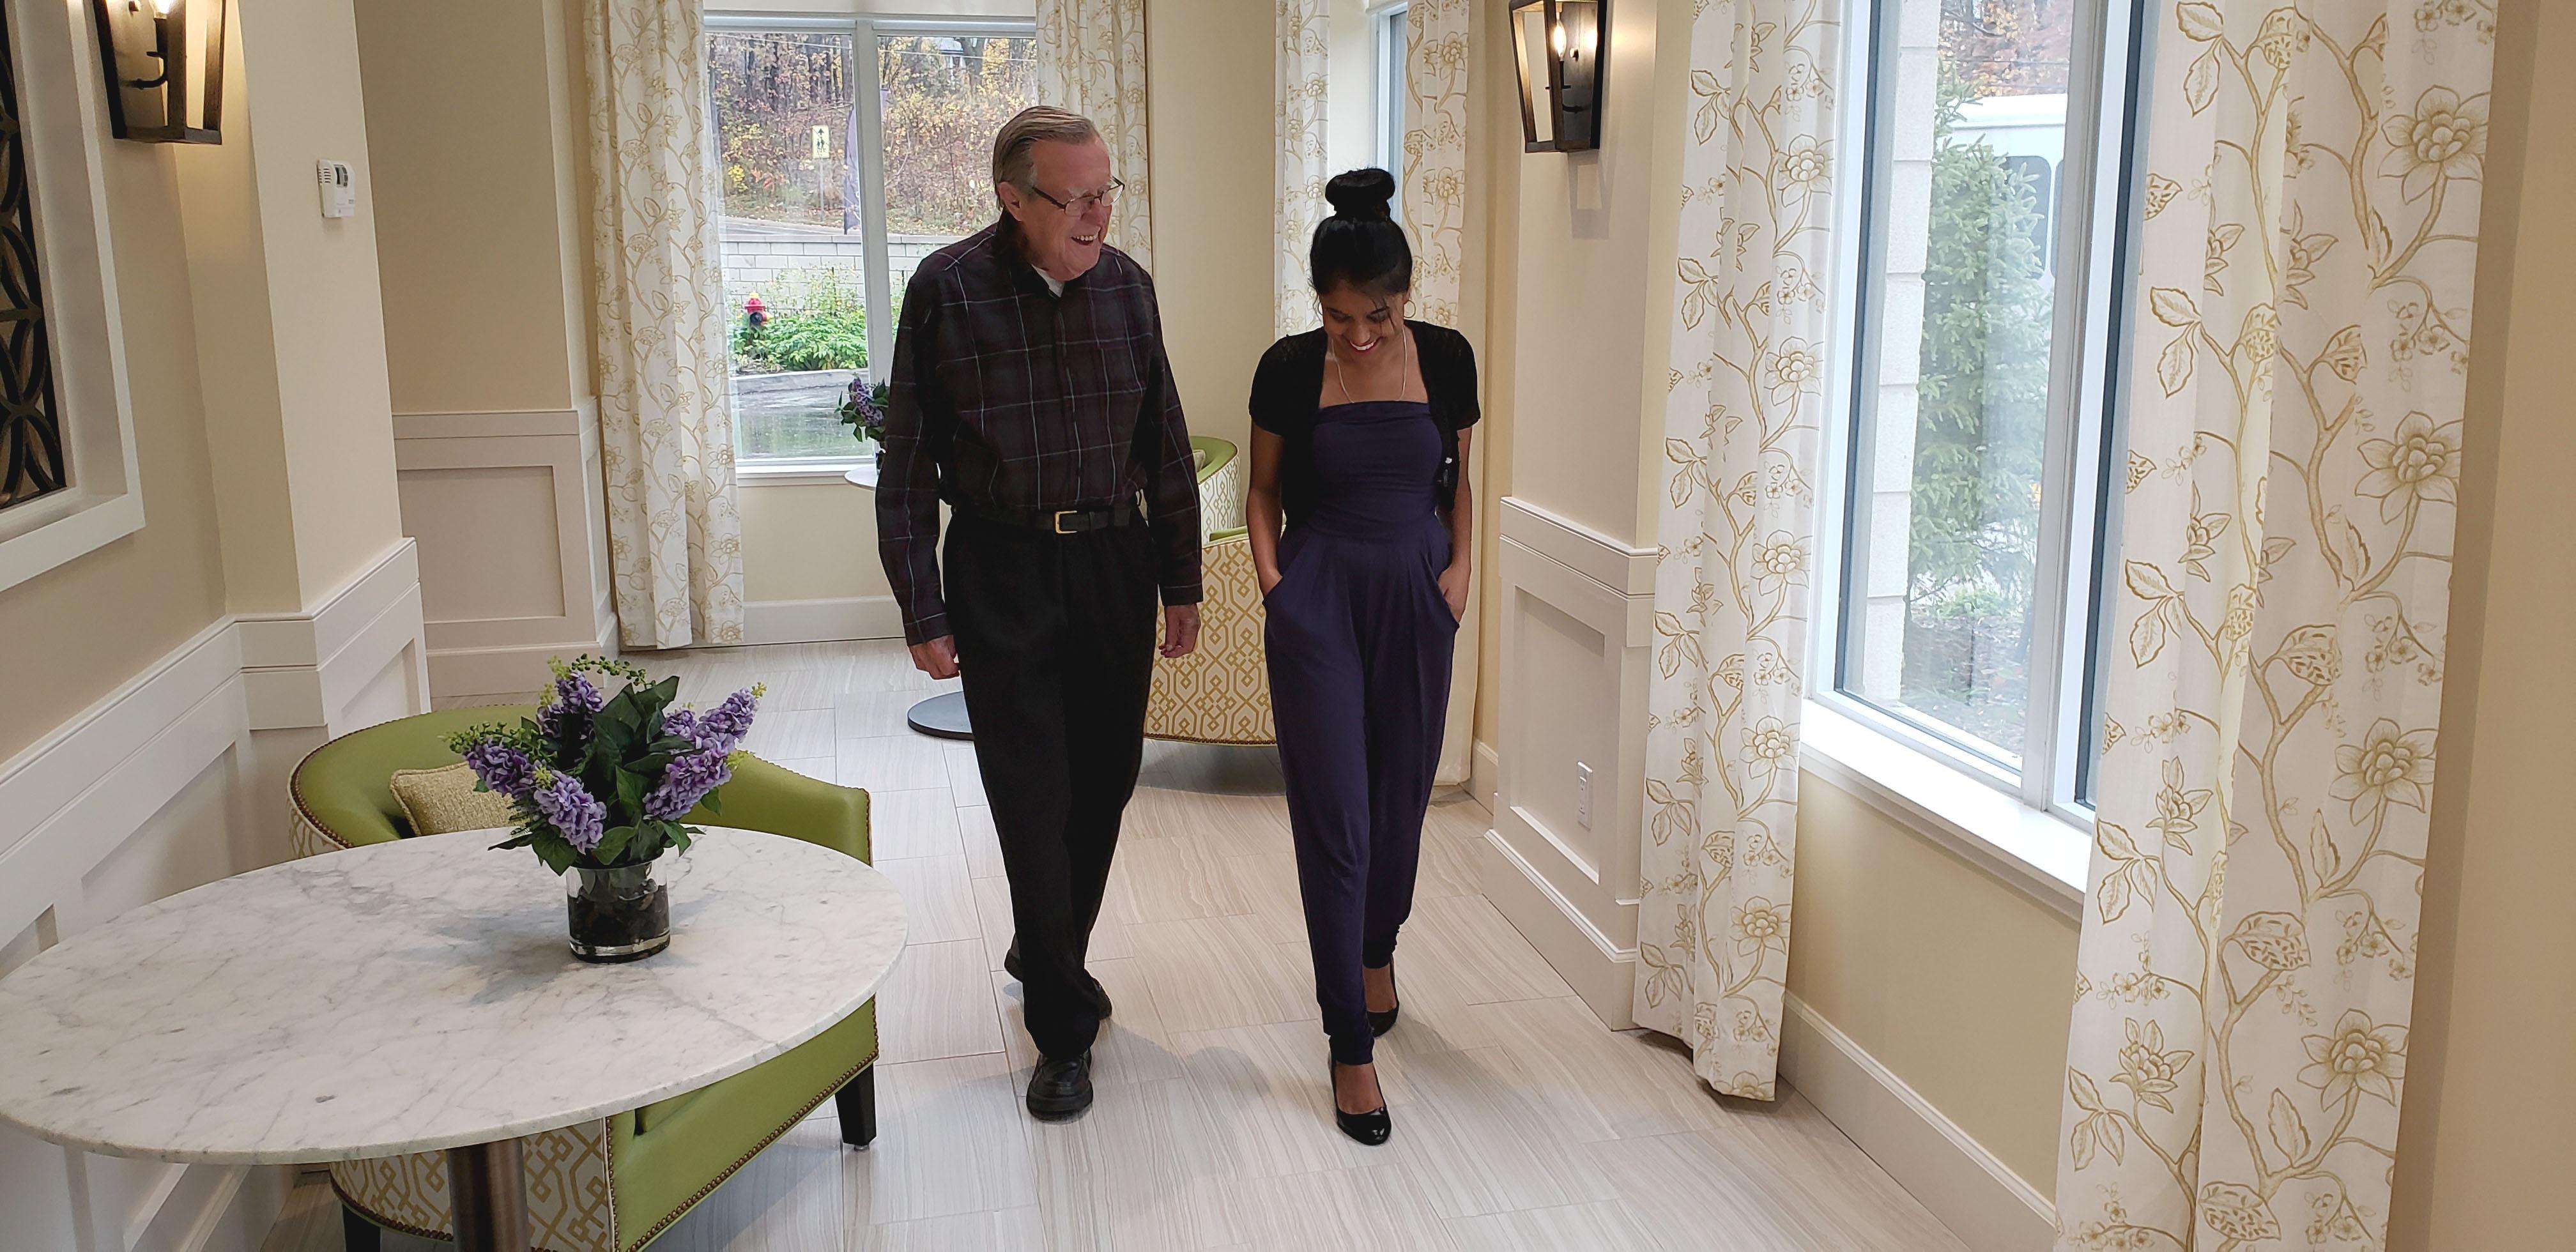 Helping seniors move to retirement living